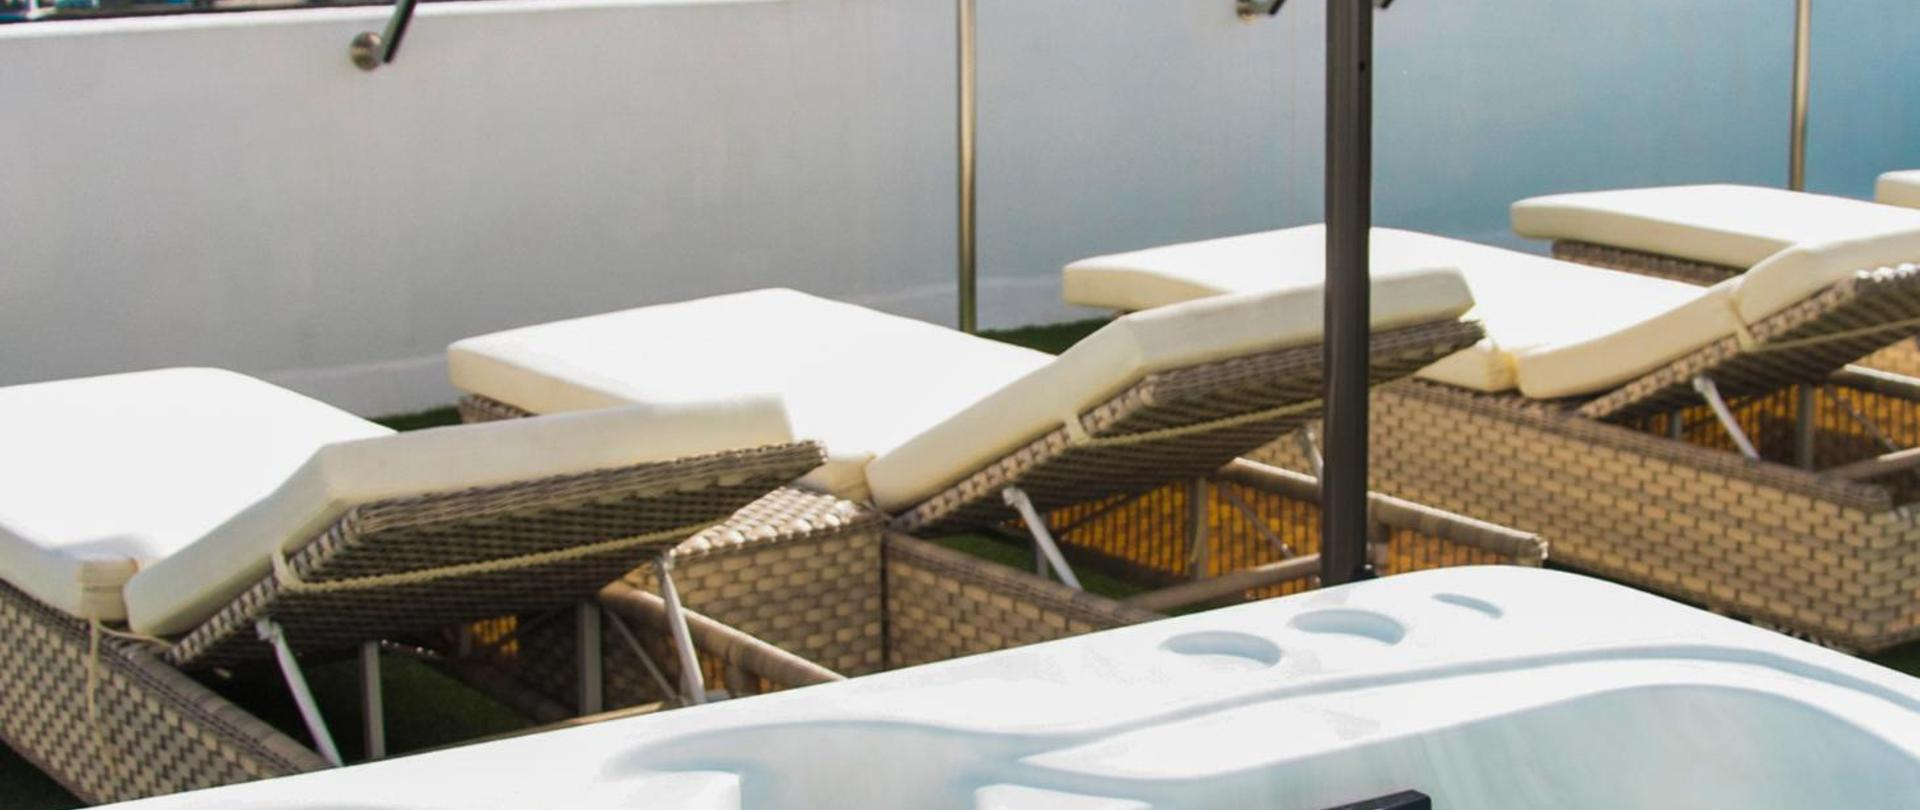 Hotel Islamar by Onlaurens-18.jpg